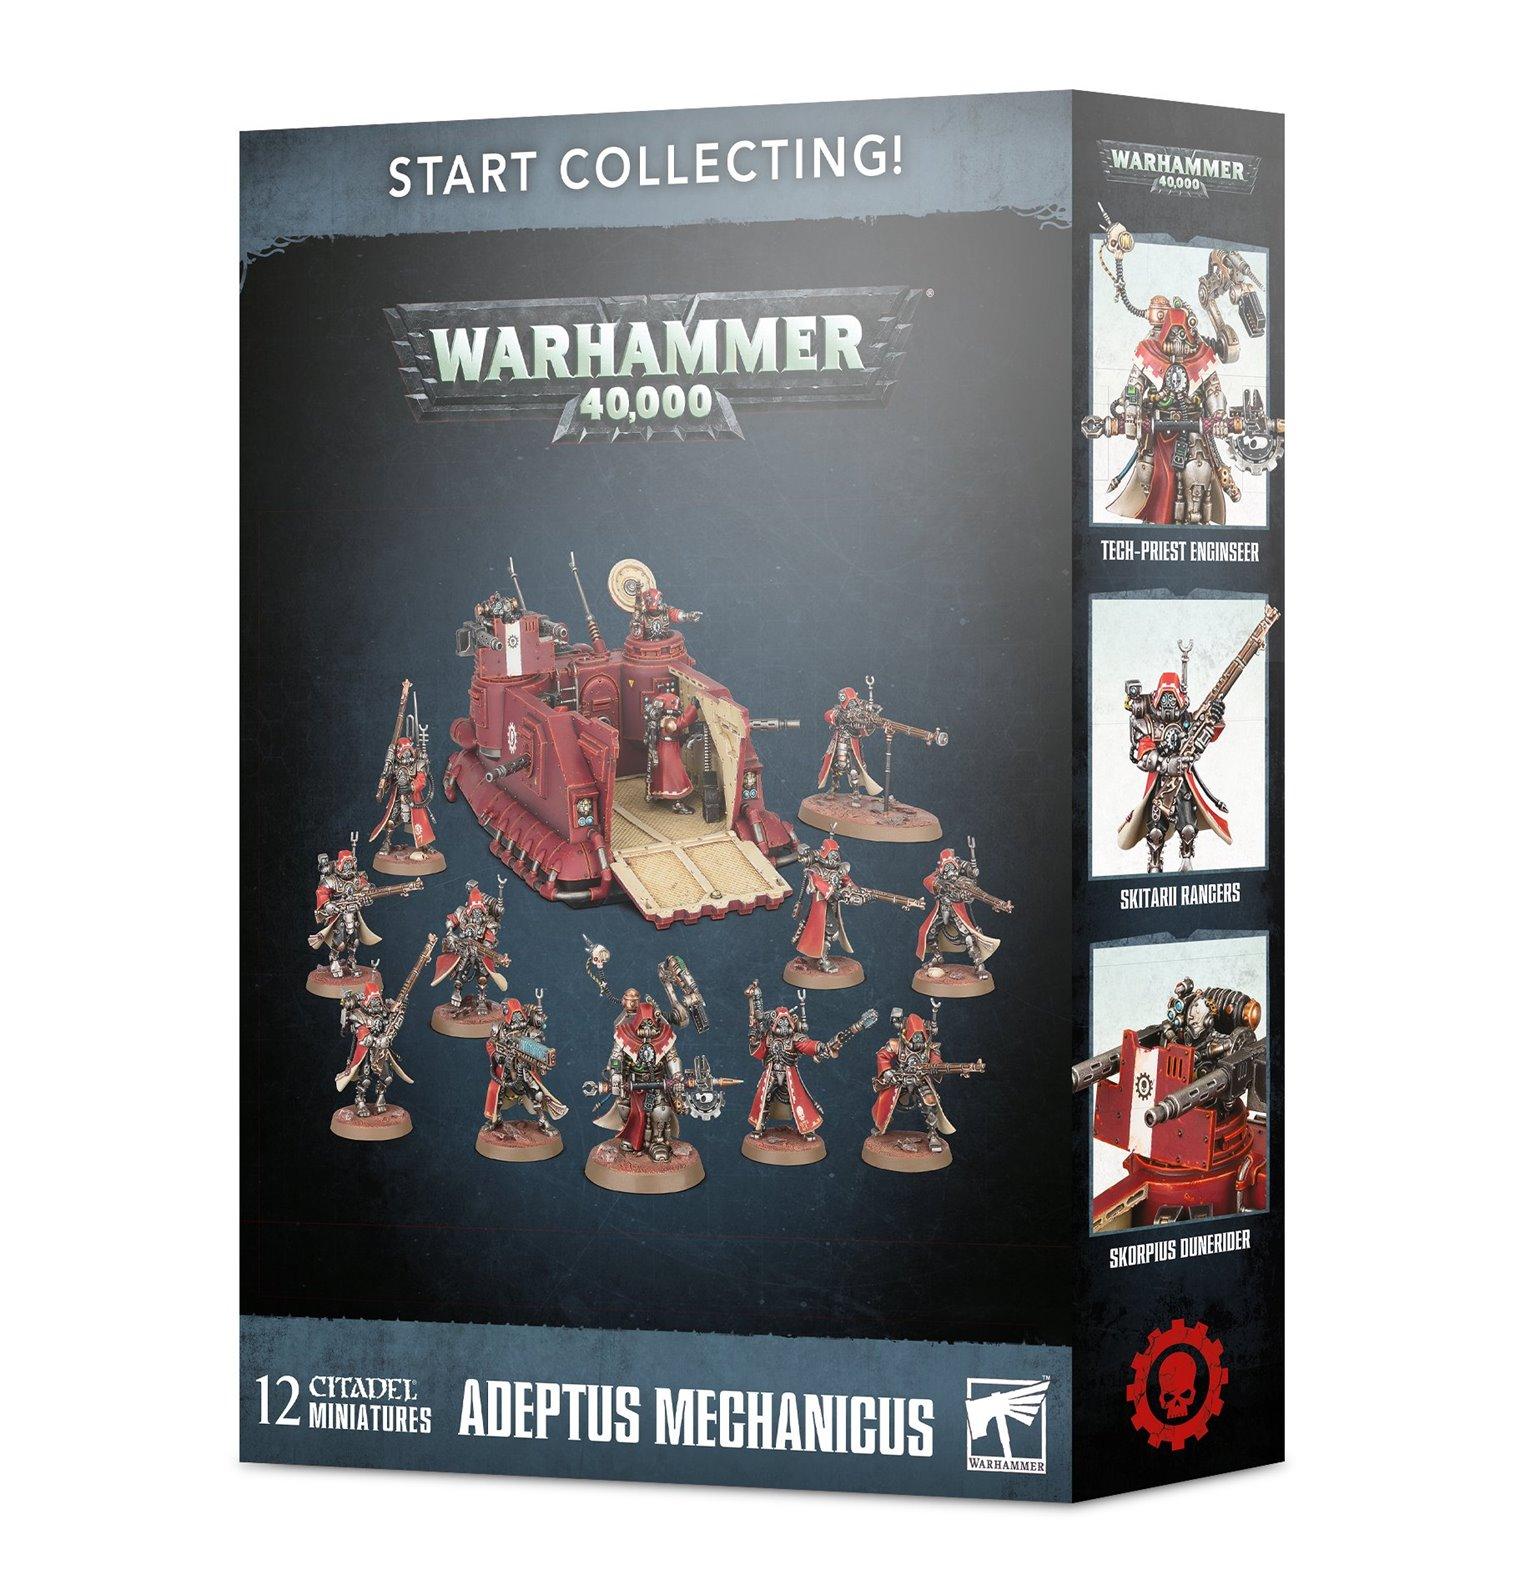 Warhammer 40,000 Start Collecting! Adeptus Mechanicus